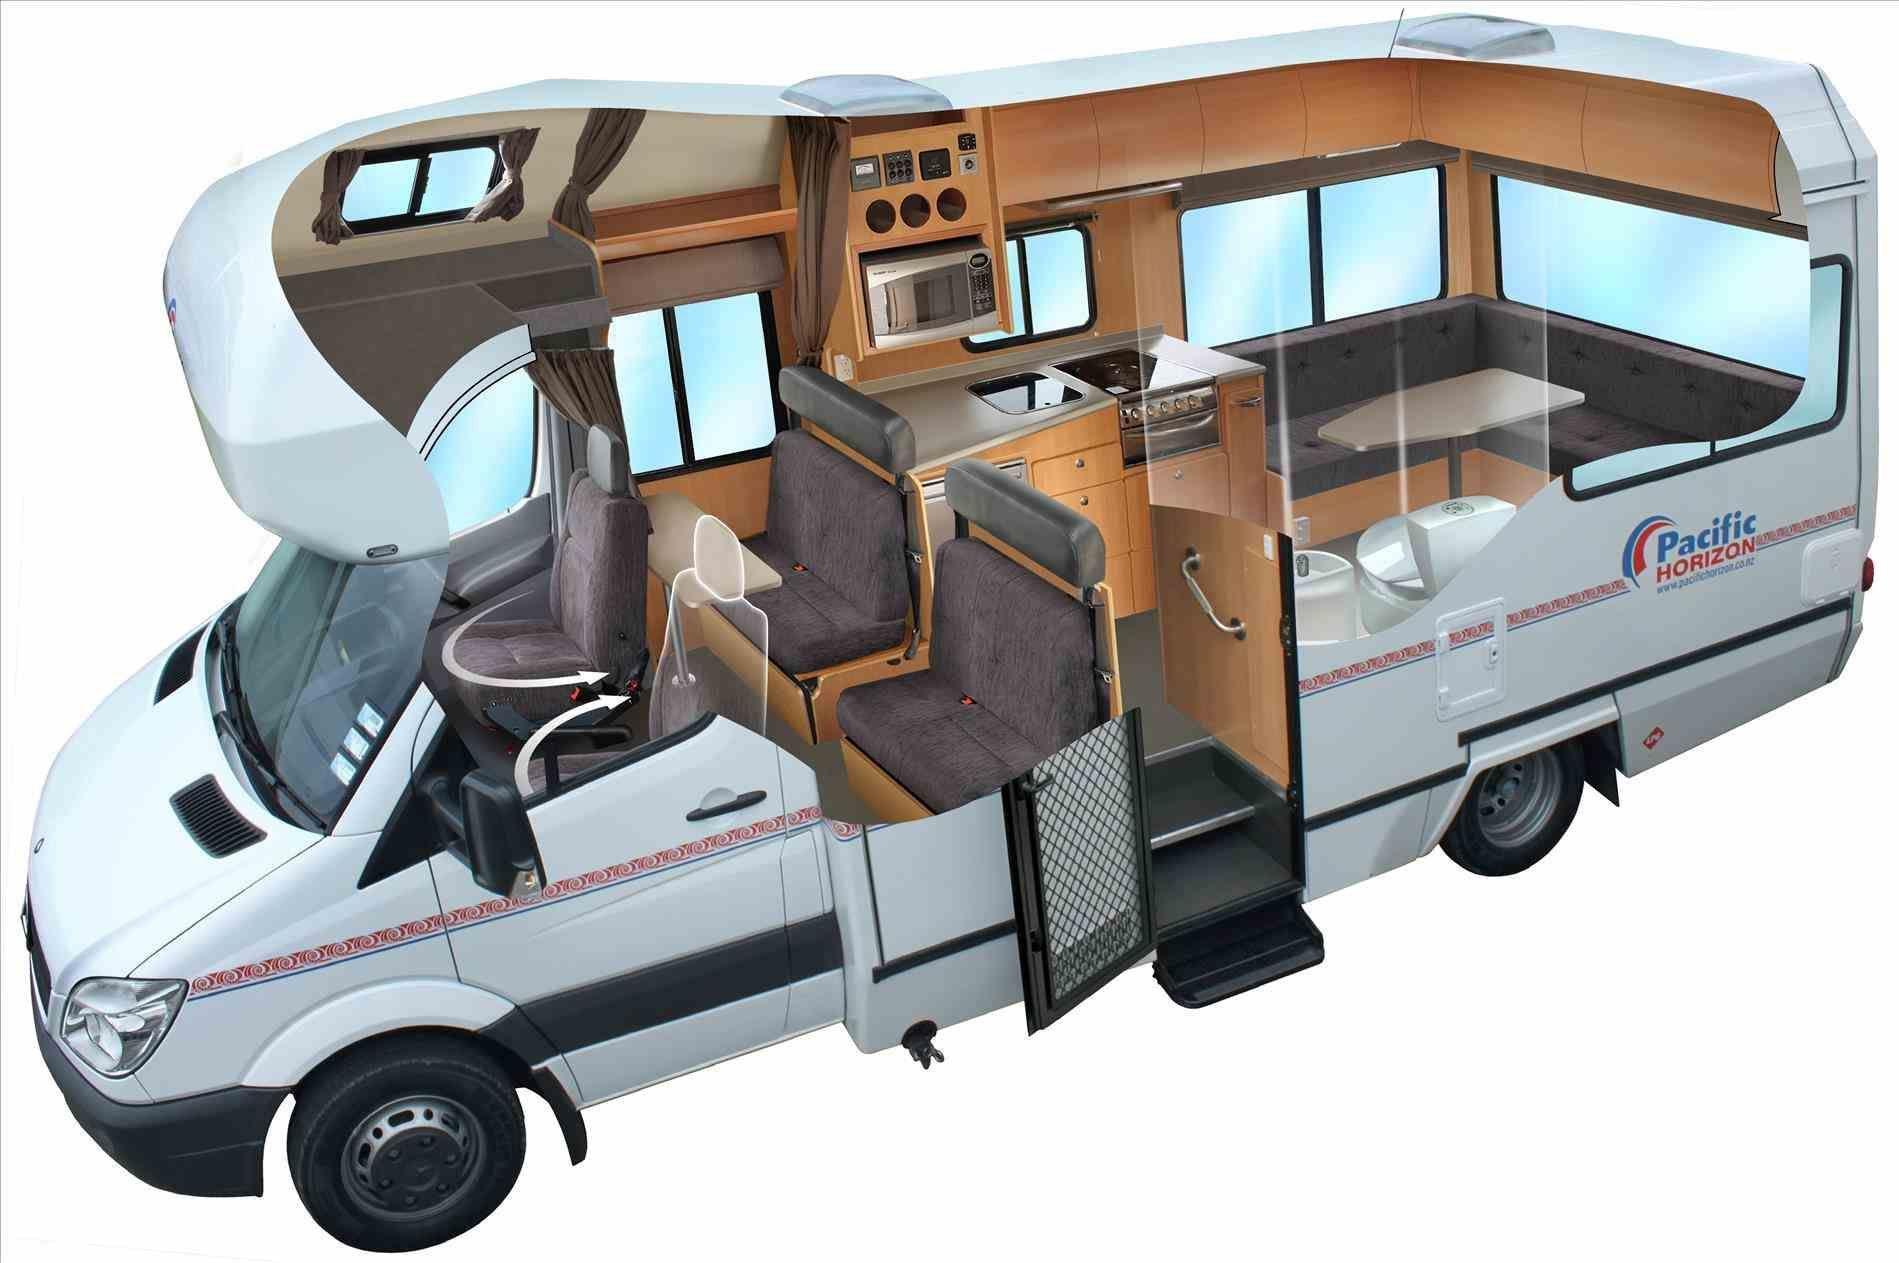 small rv rental Small rv Rv campers and Rv | Small rv ...